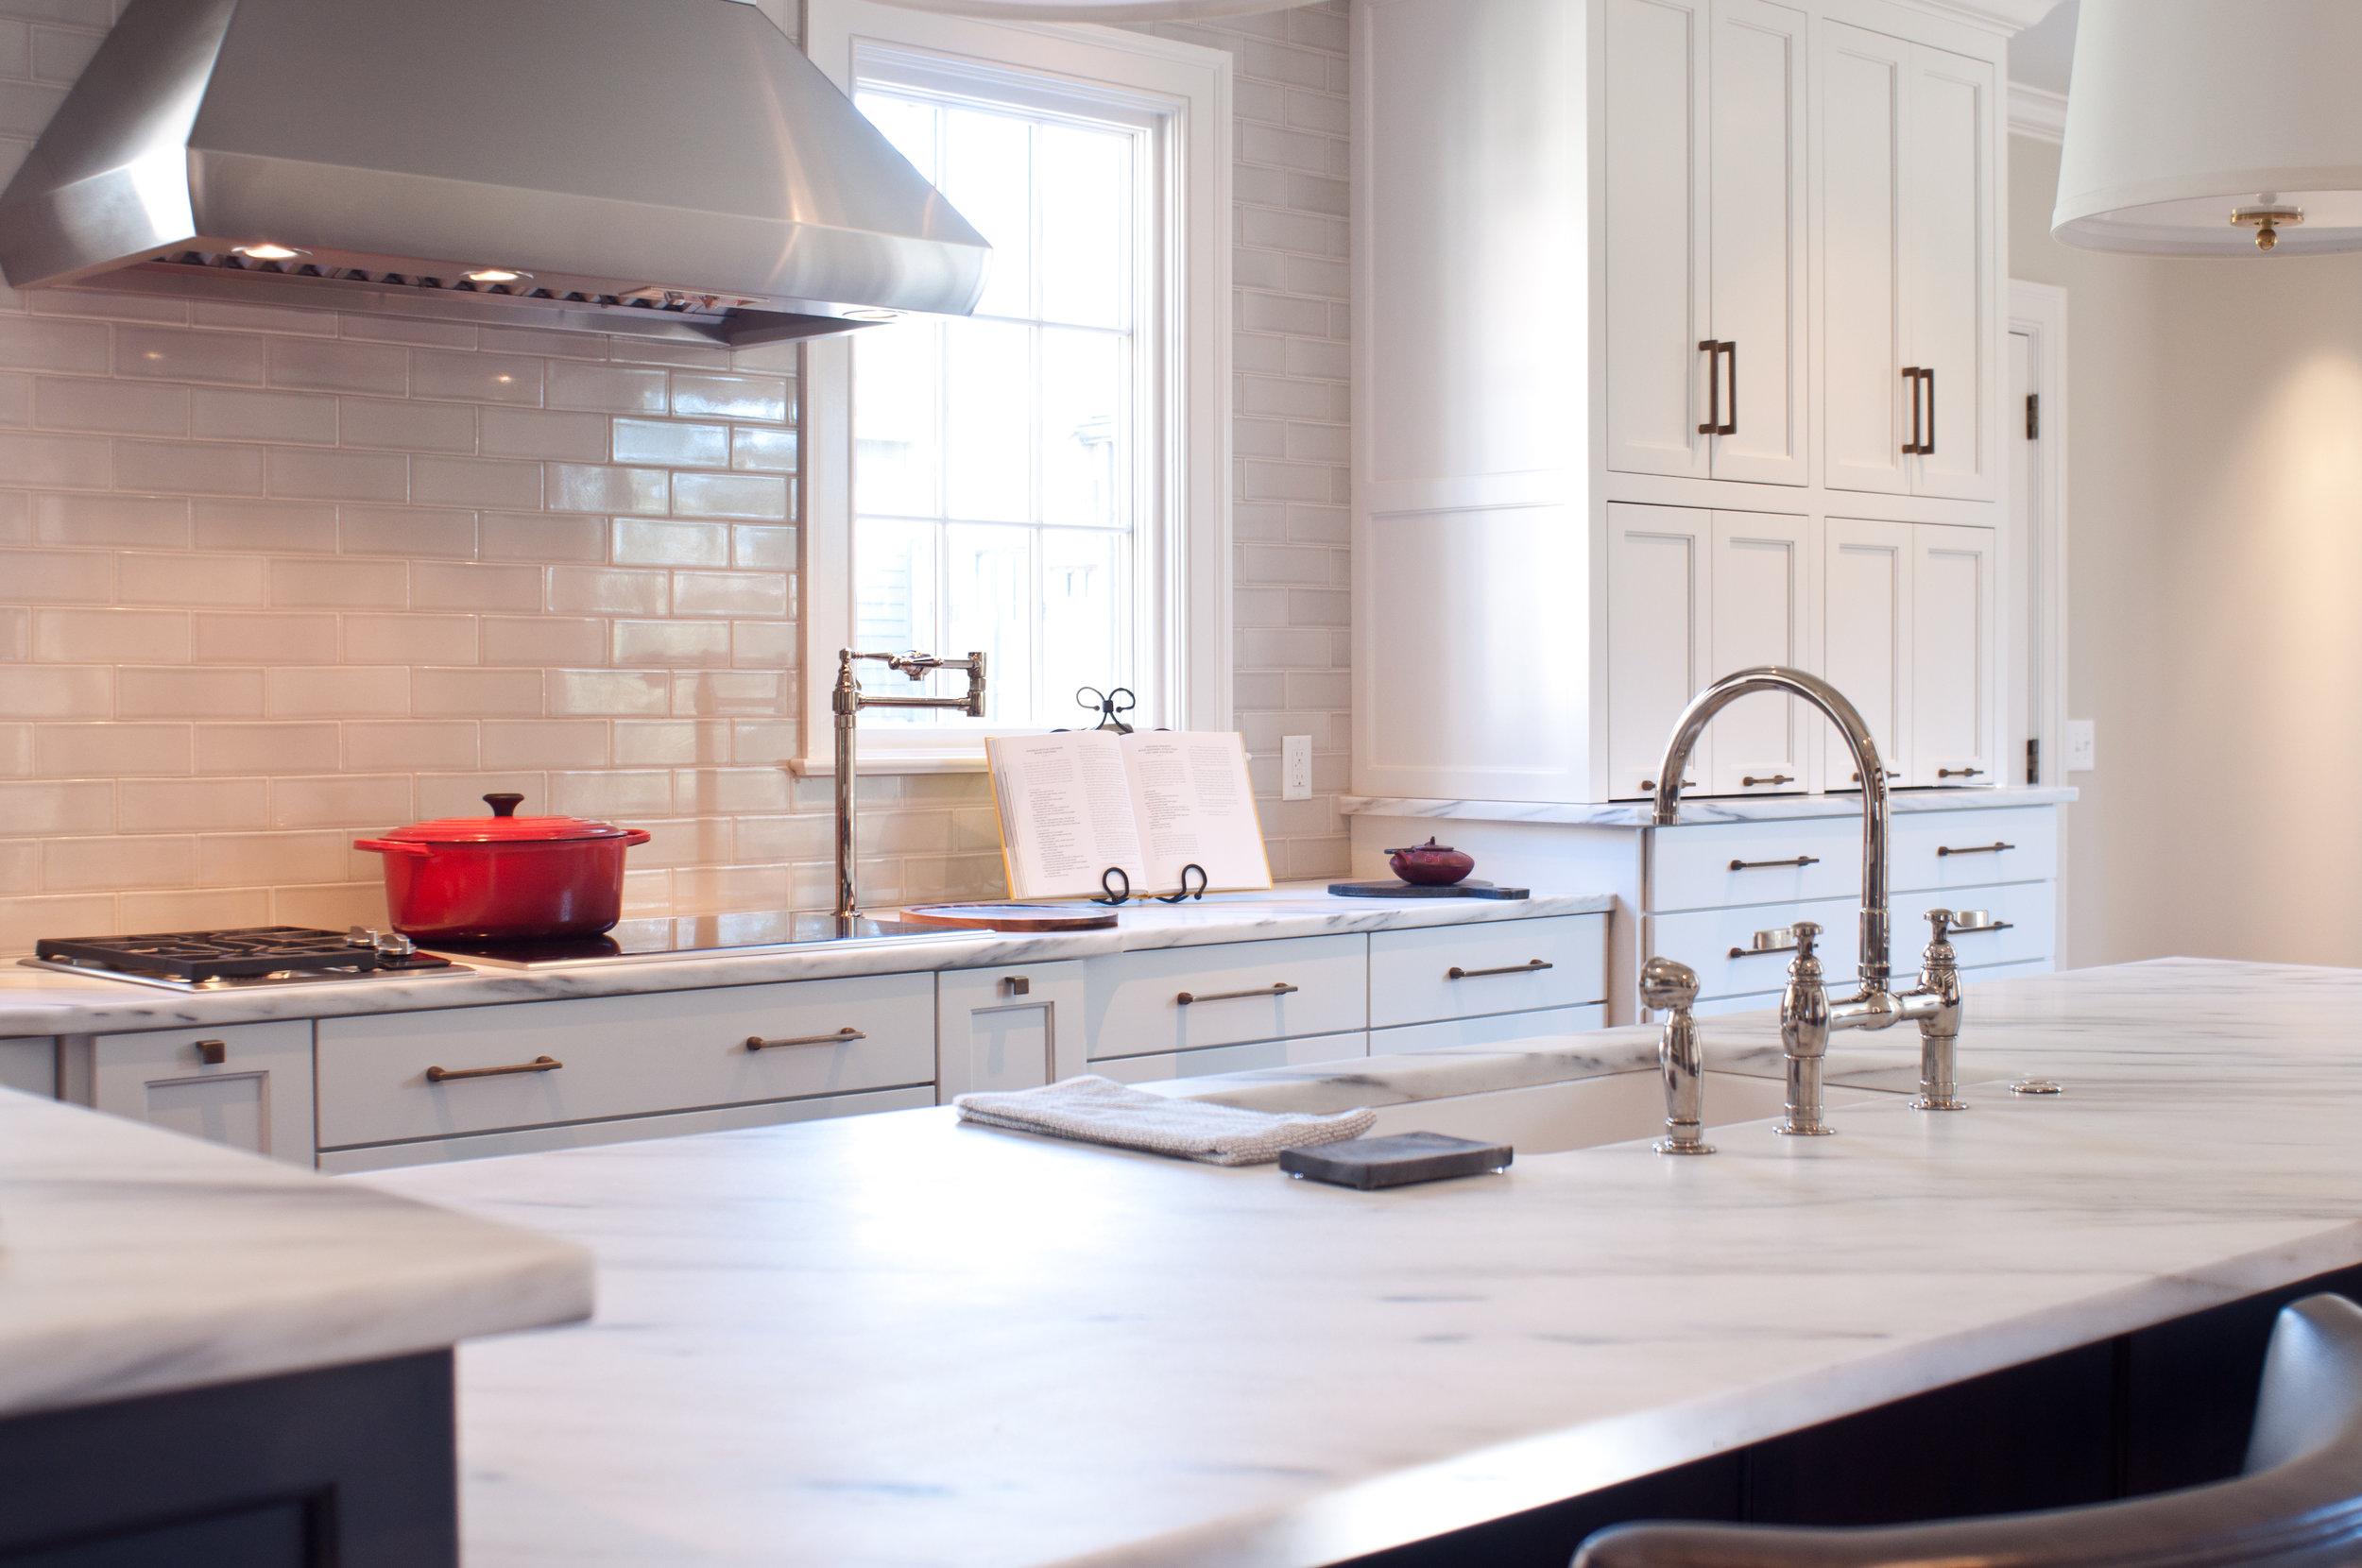 Transitional+Barrett+Kitchen+2.jpg